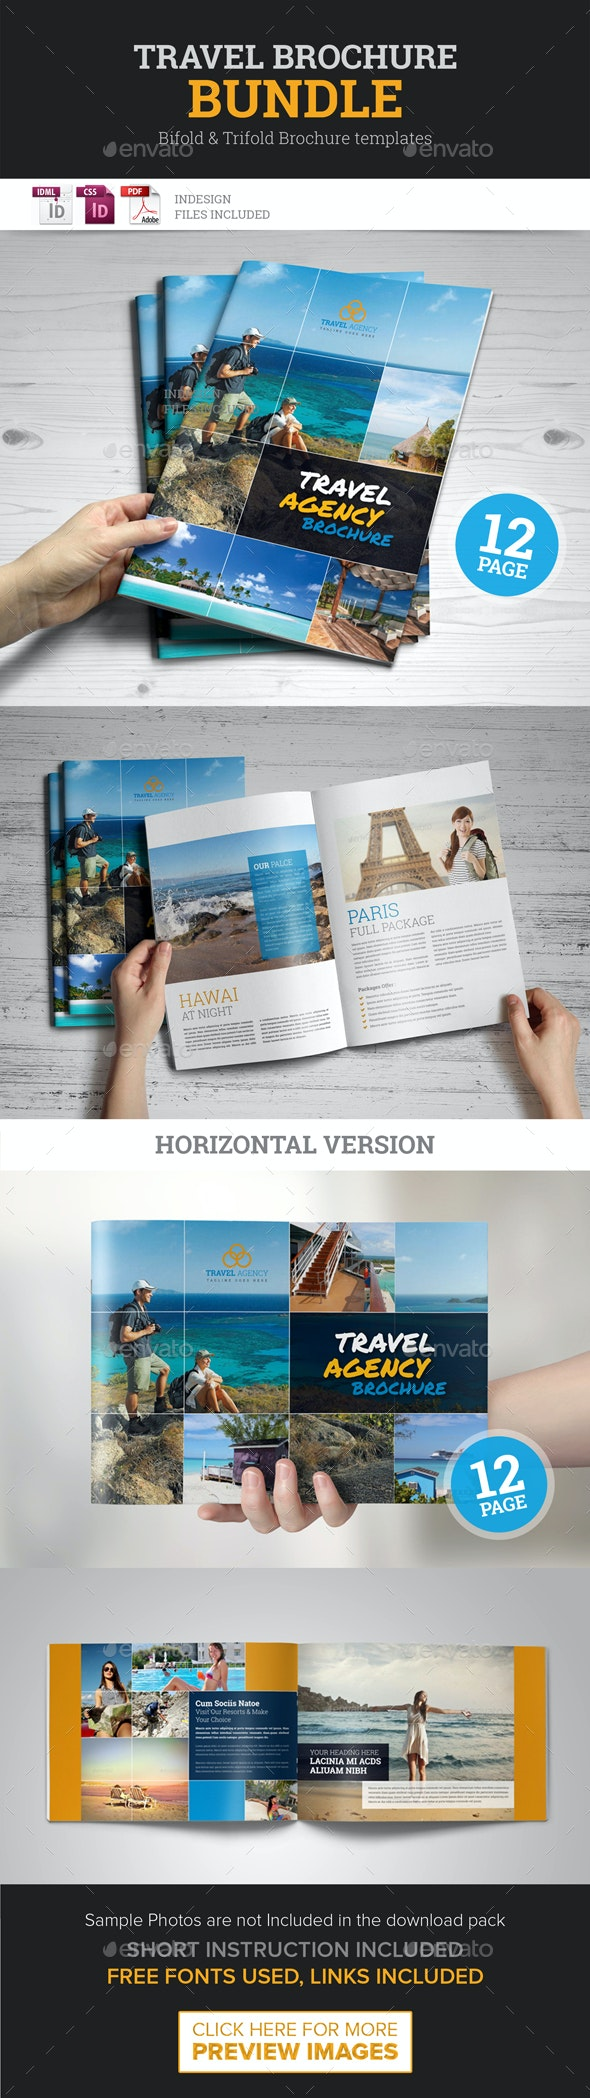 Travel Agency Brochure Bundle 2 in 1 - Corporate Brochures